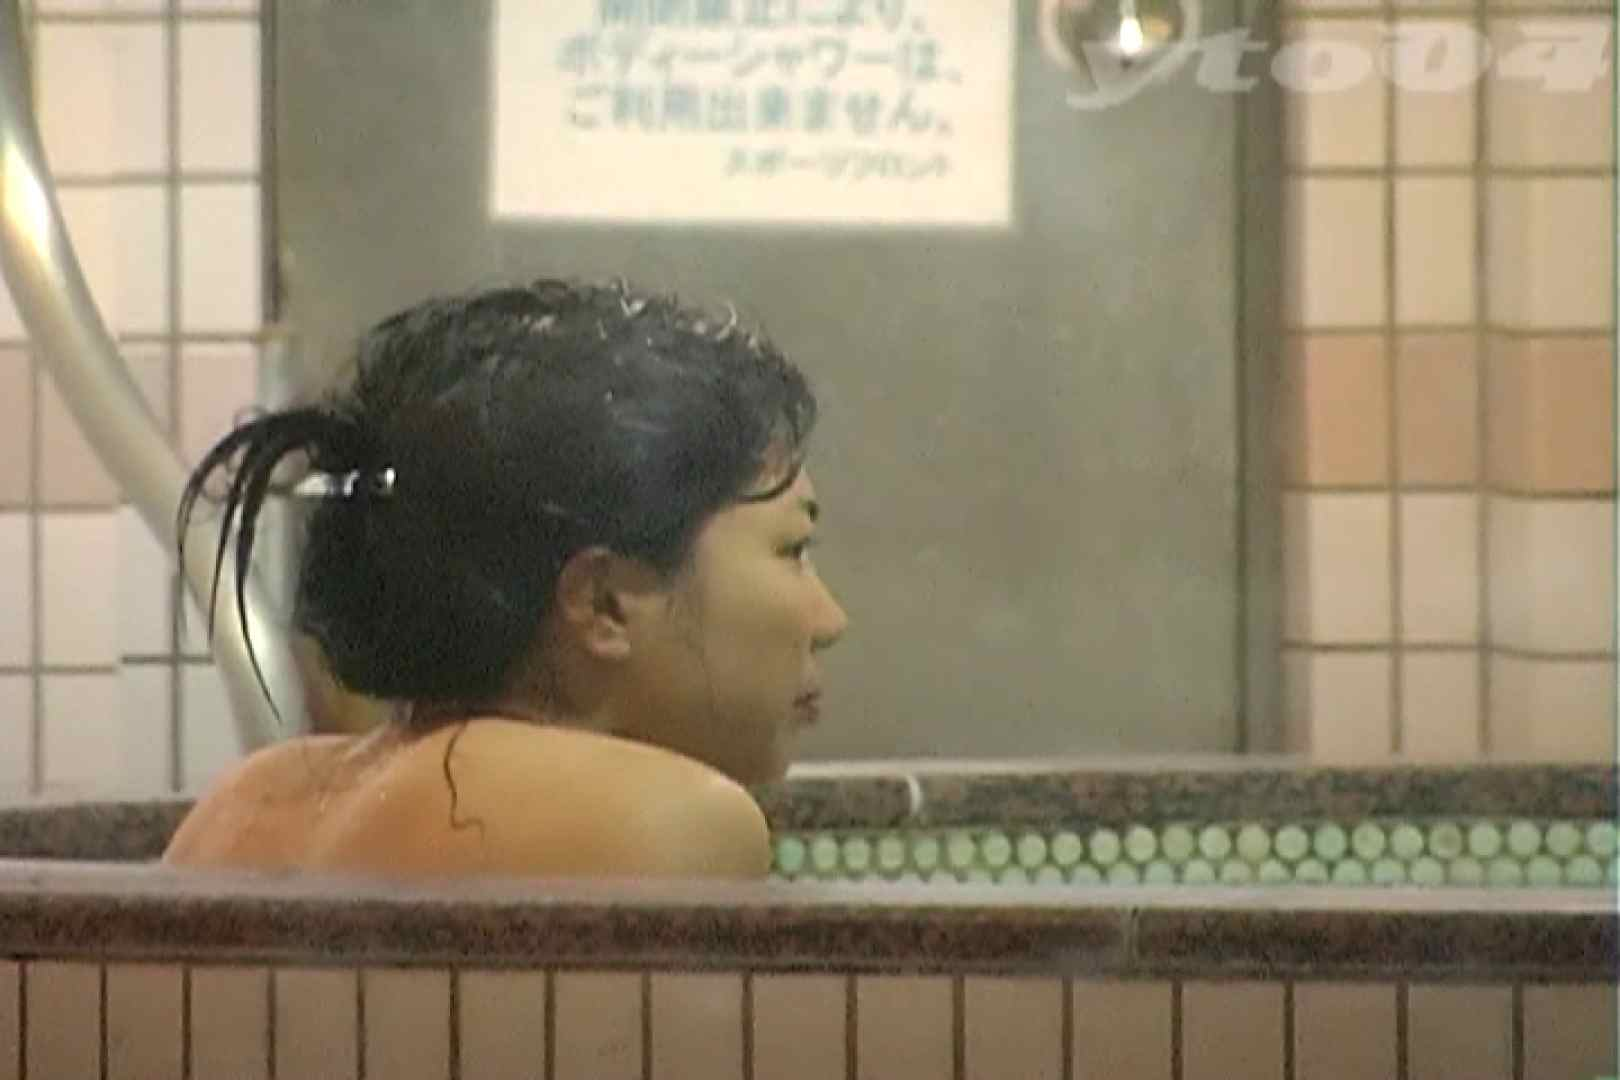 ▲復活限定▲合宿ホテル女風呂盗撮 Vol.24 名作  55pic 23